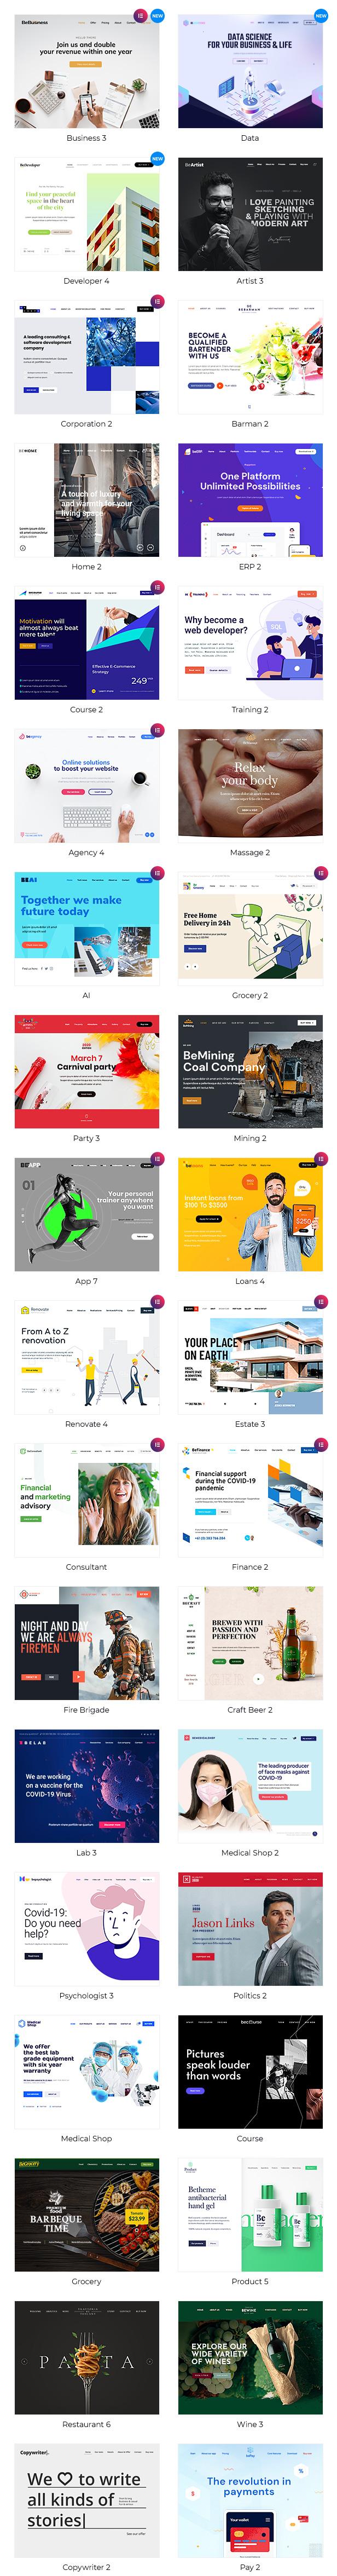 layouts 2176 top - BeTheme - Responsive Multi-Purpose WordPress Theme